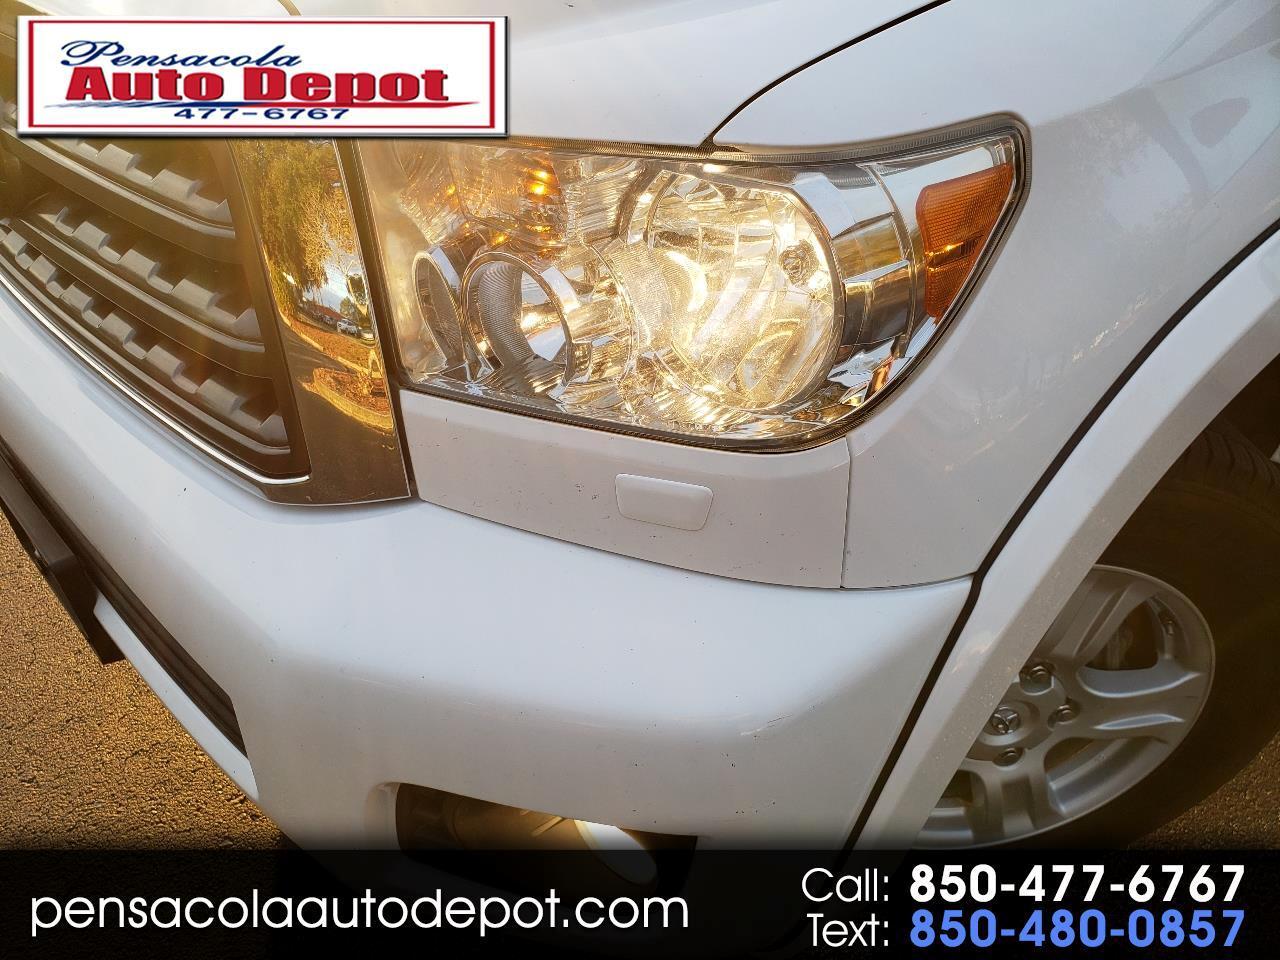 Toyota Sequoia SR5 5.7L 2WD 2013